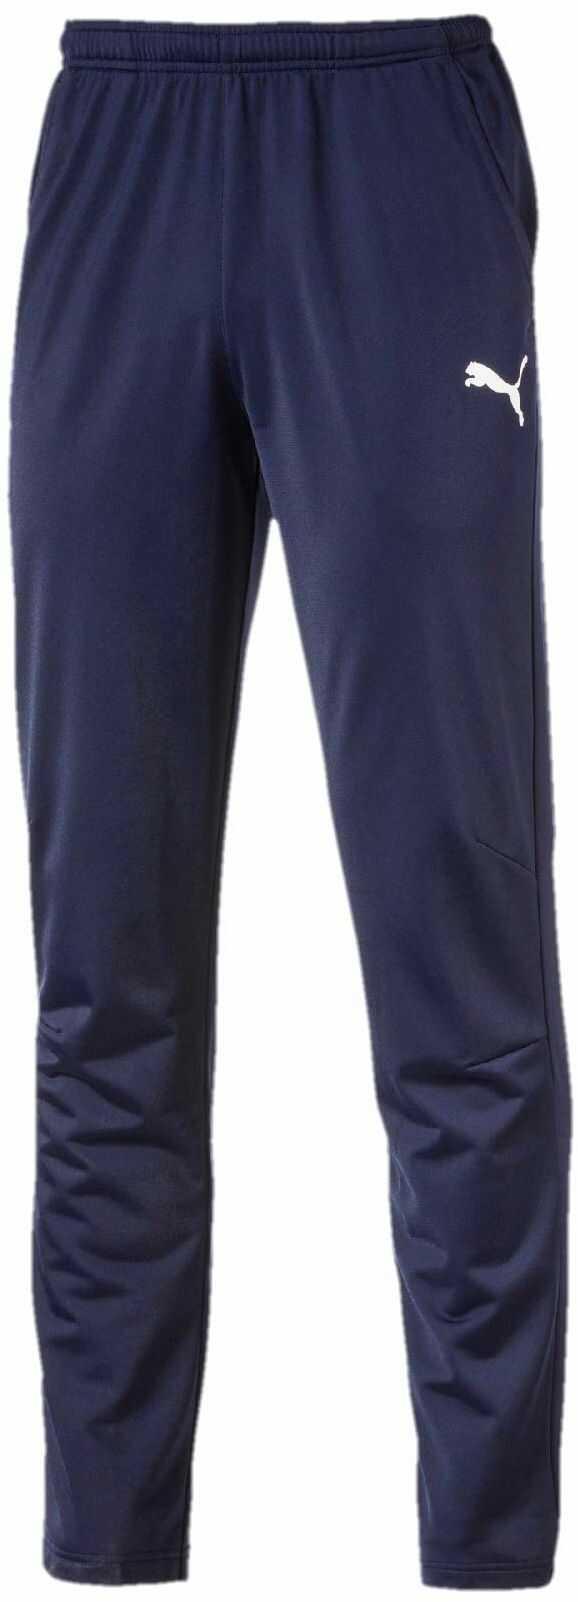 PUMA Męskie spodnie treningowe LIGA Training Pant Core niebieski Peacoat-Puma White S